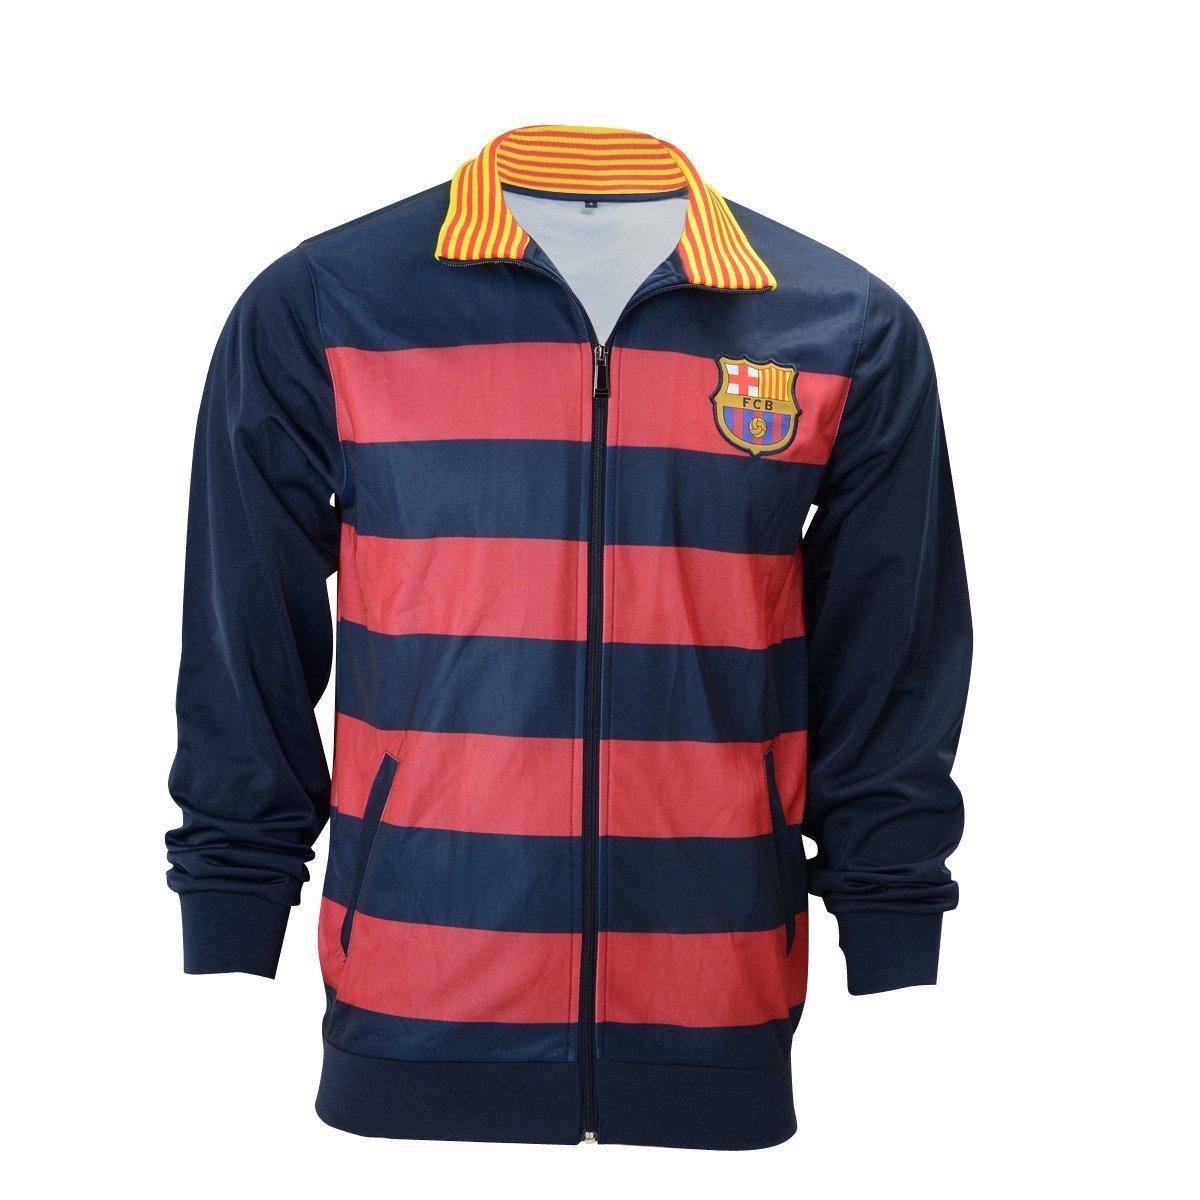 FCバルセロナトラックジャケット大人用サッカーメッシ、新しいシーズンサイズSmall B01N1KRHA6